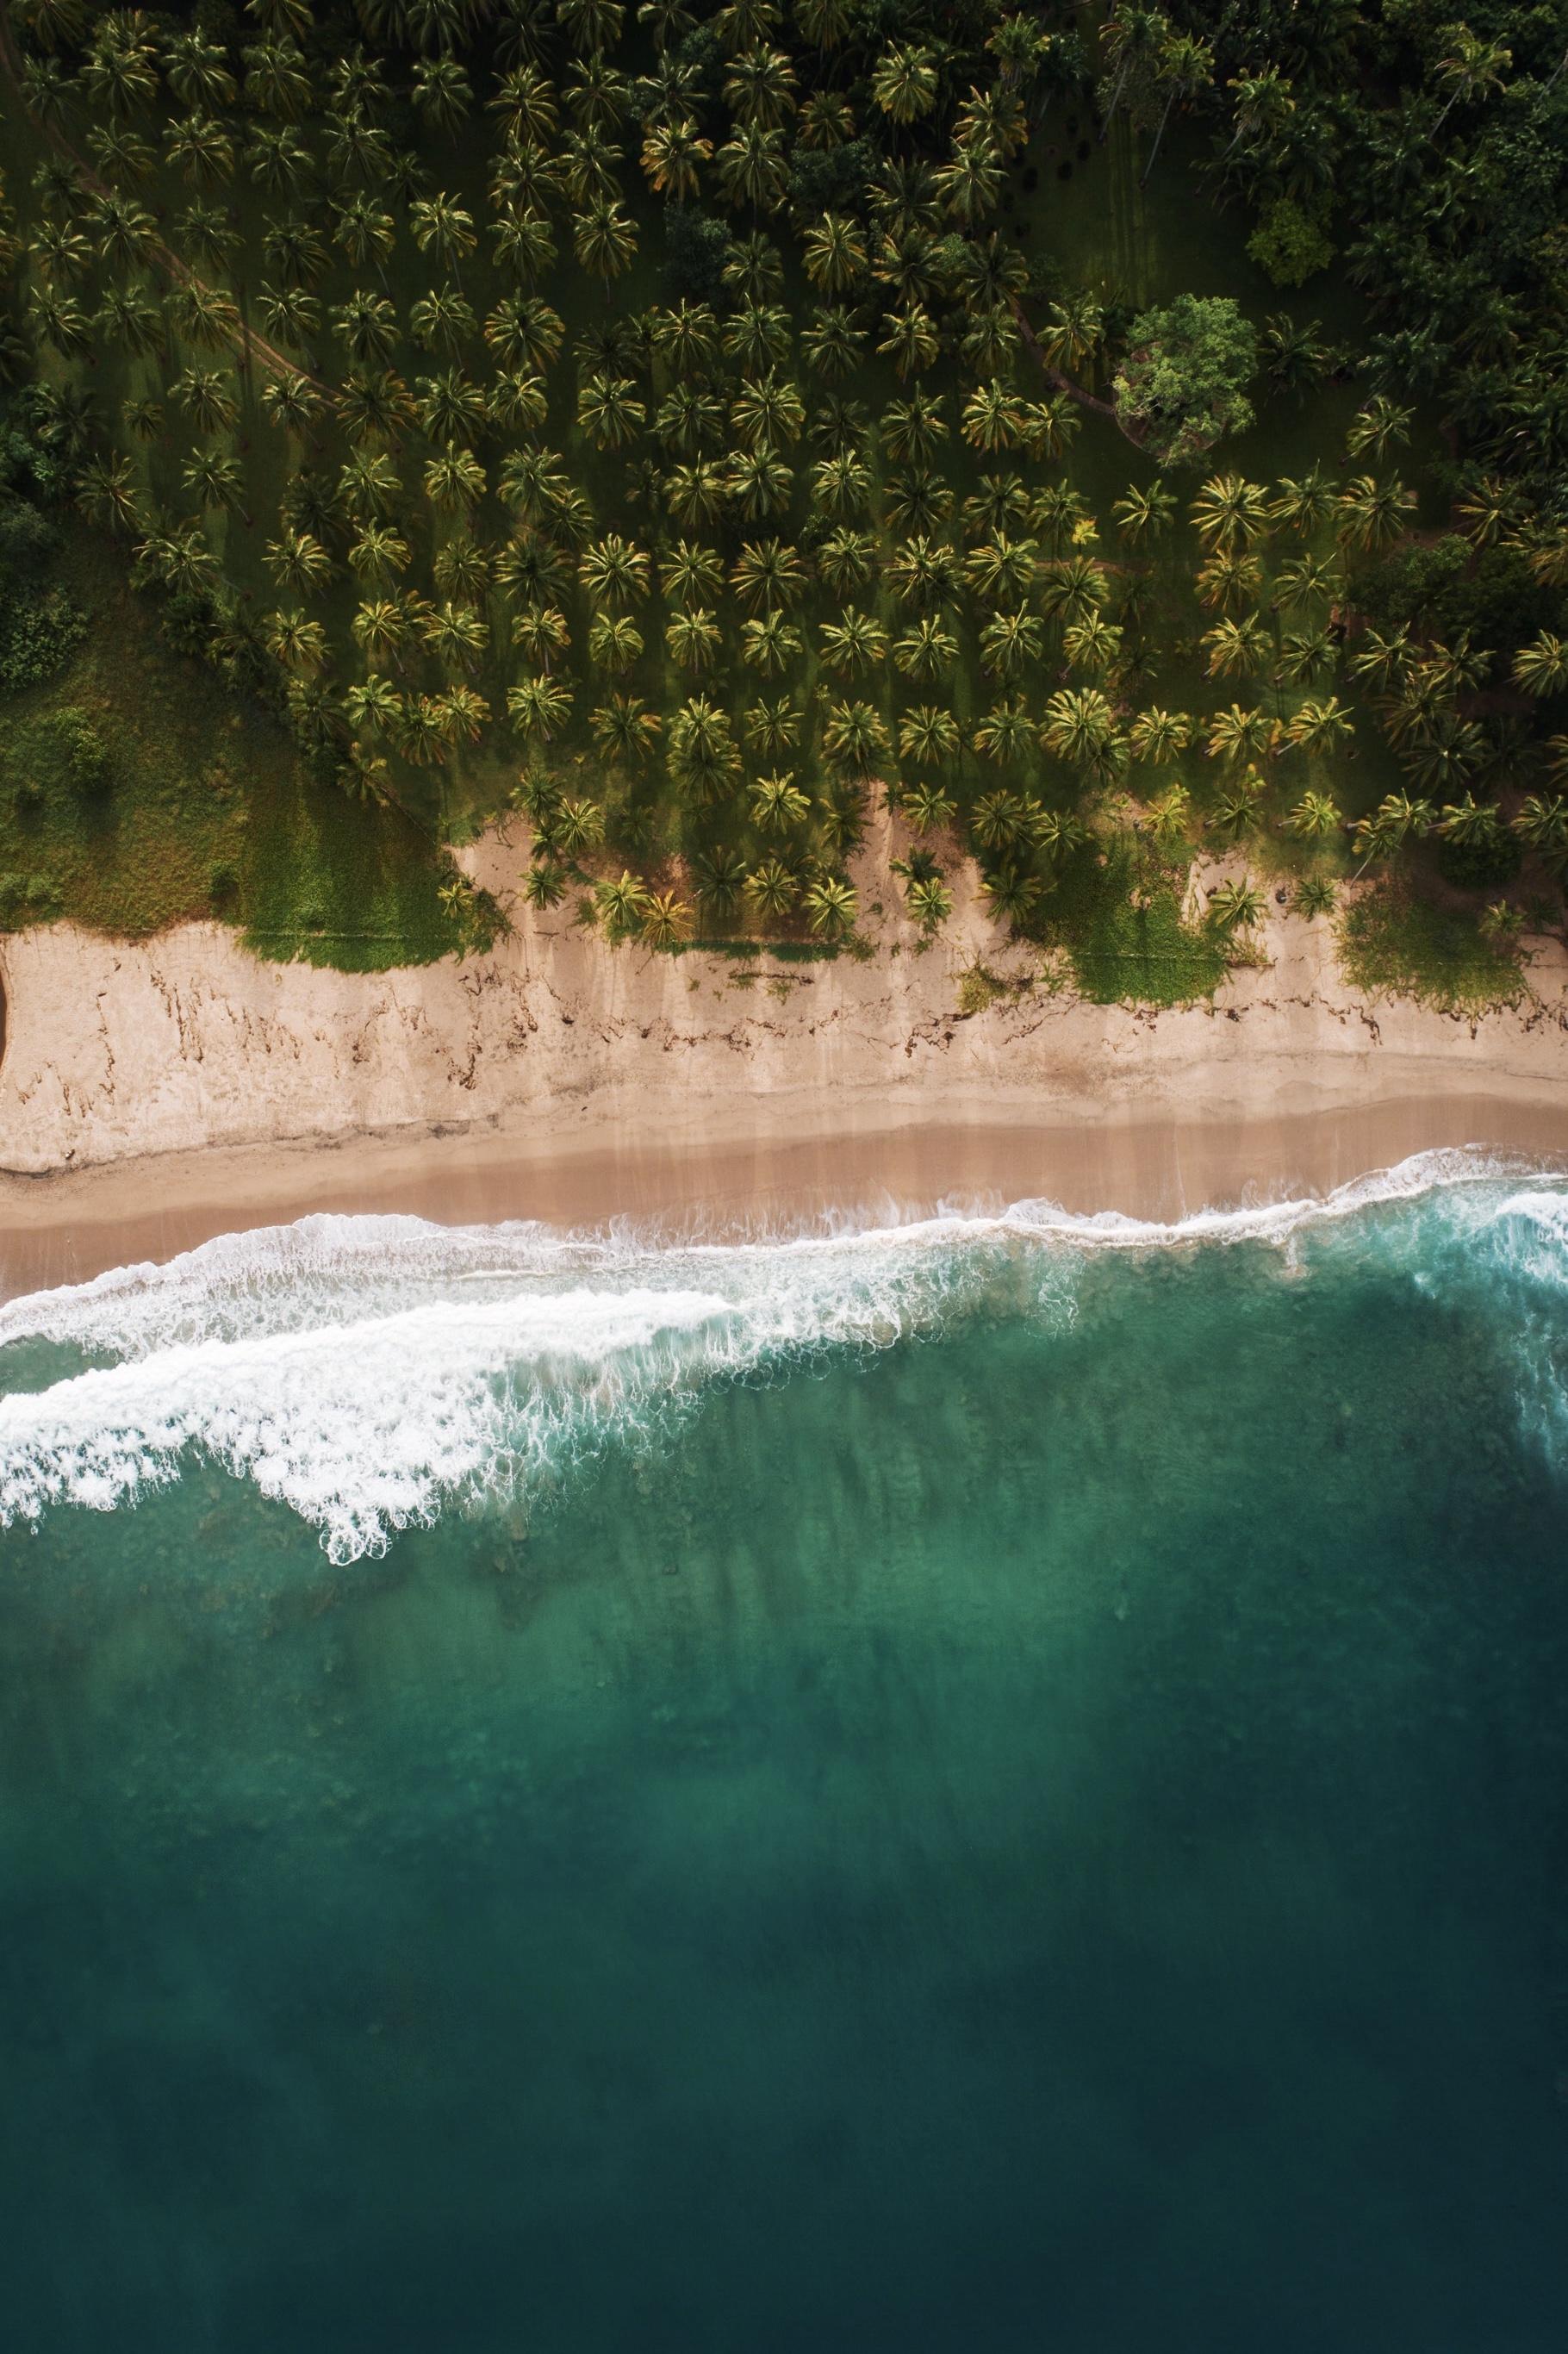 Tristan-Guibald-Surf-México-Sayulita-Pascuales-Zihuatanejo-Fotografía-Heiko-Bothe-7.jpg